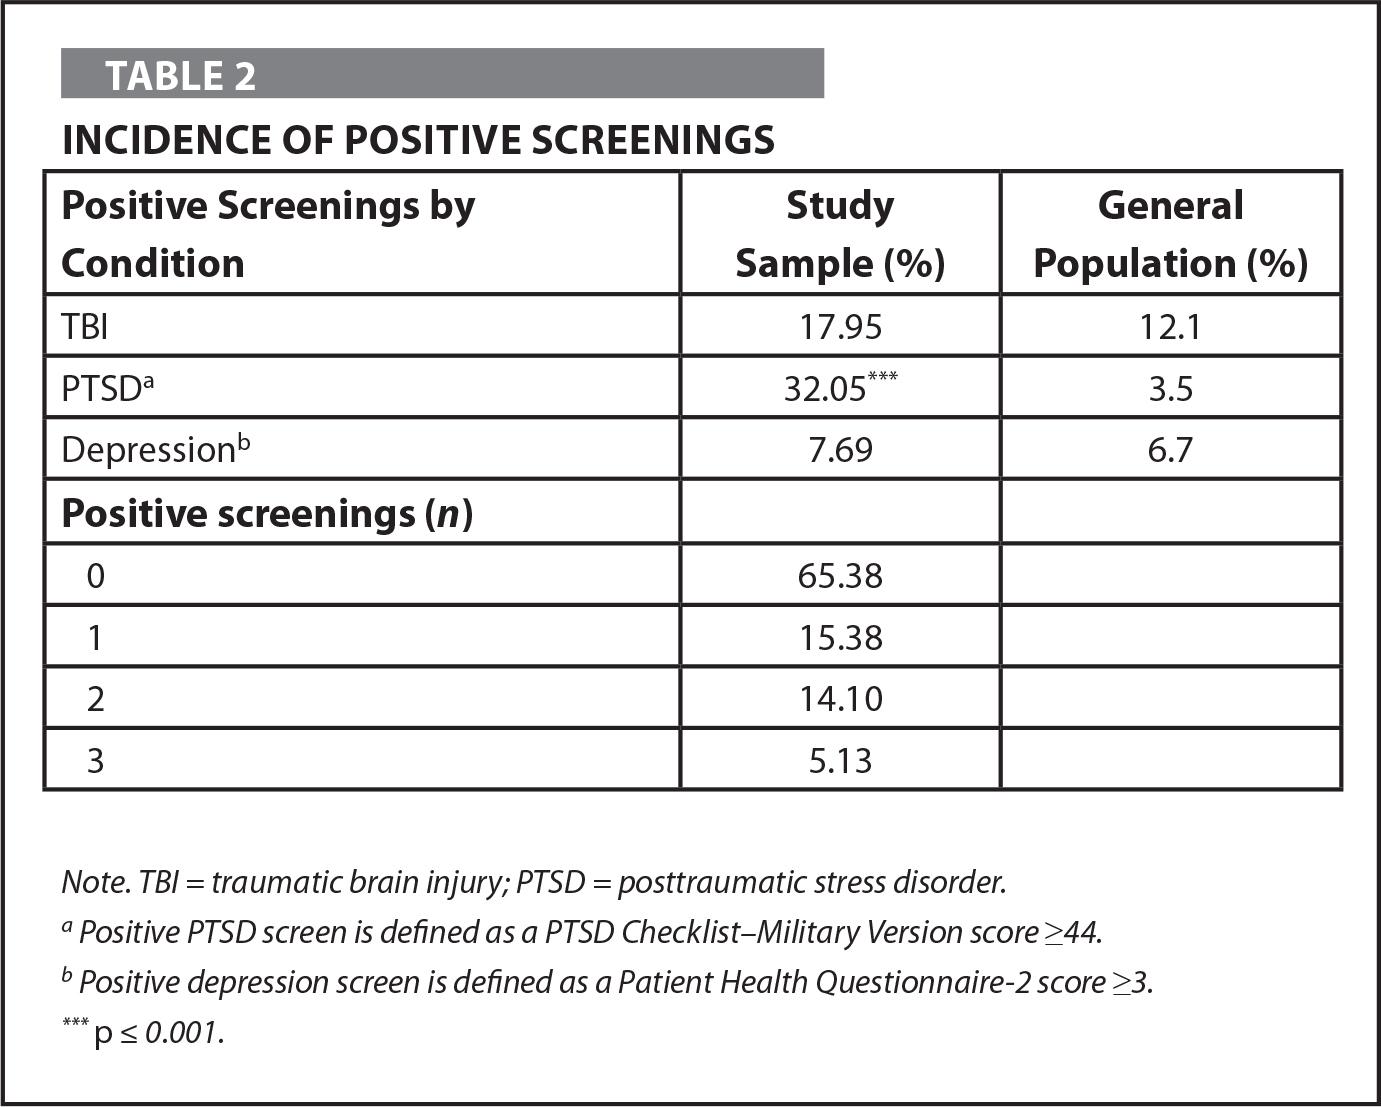 Incidence of Positive Screenings